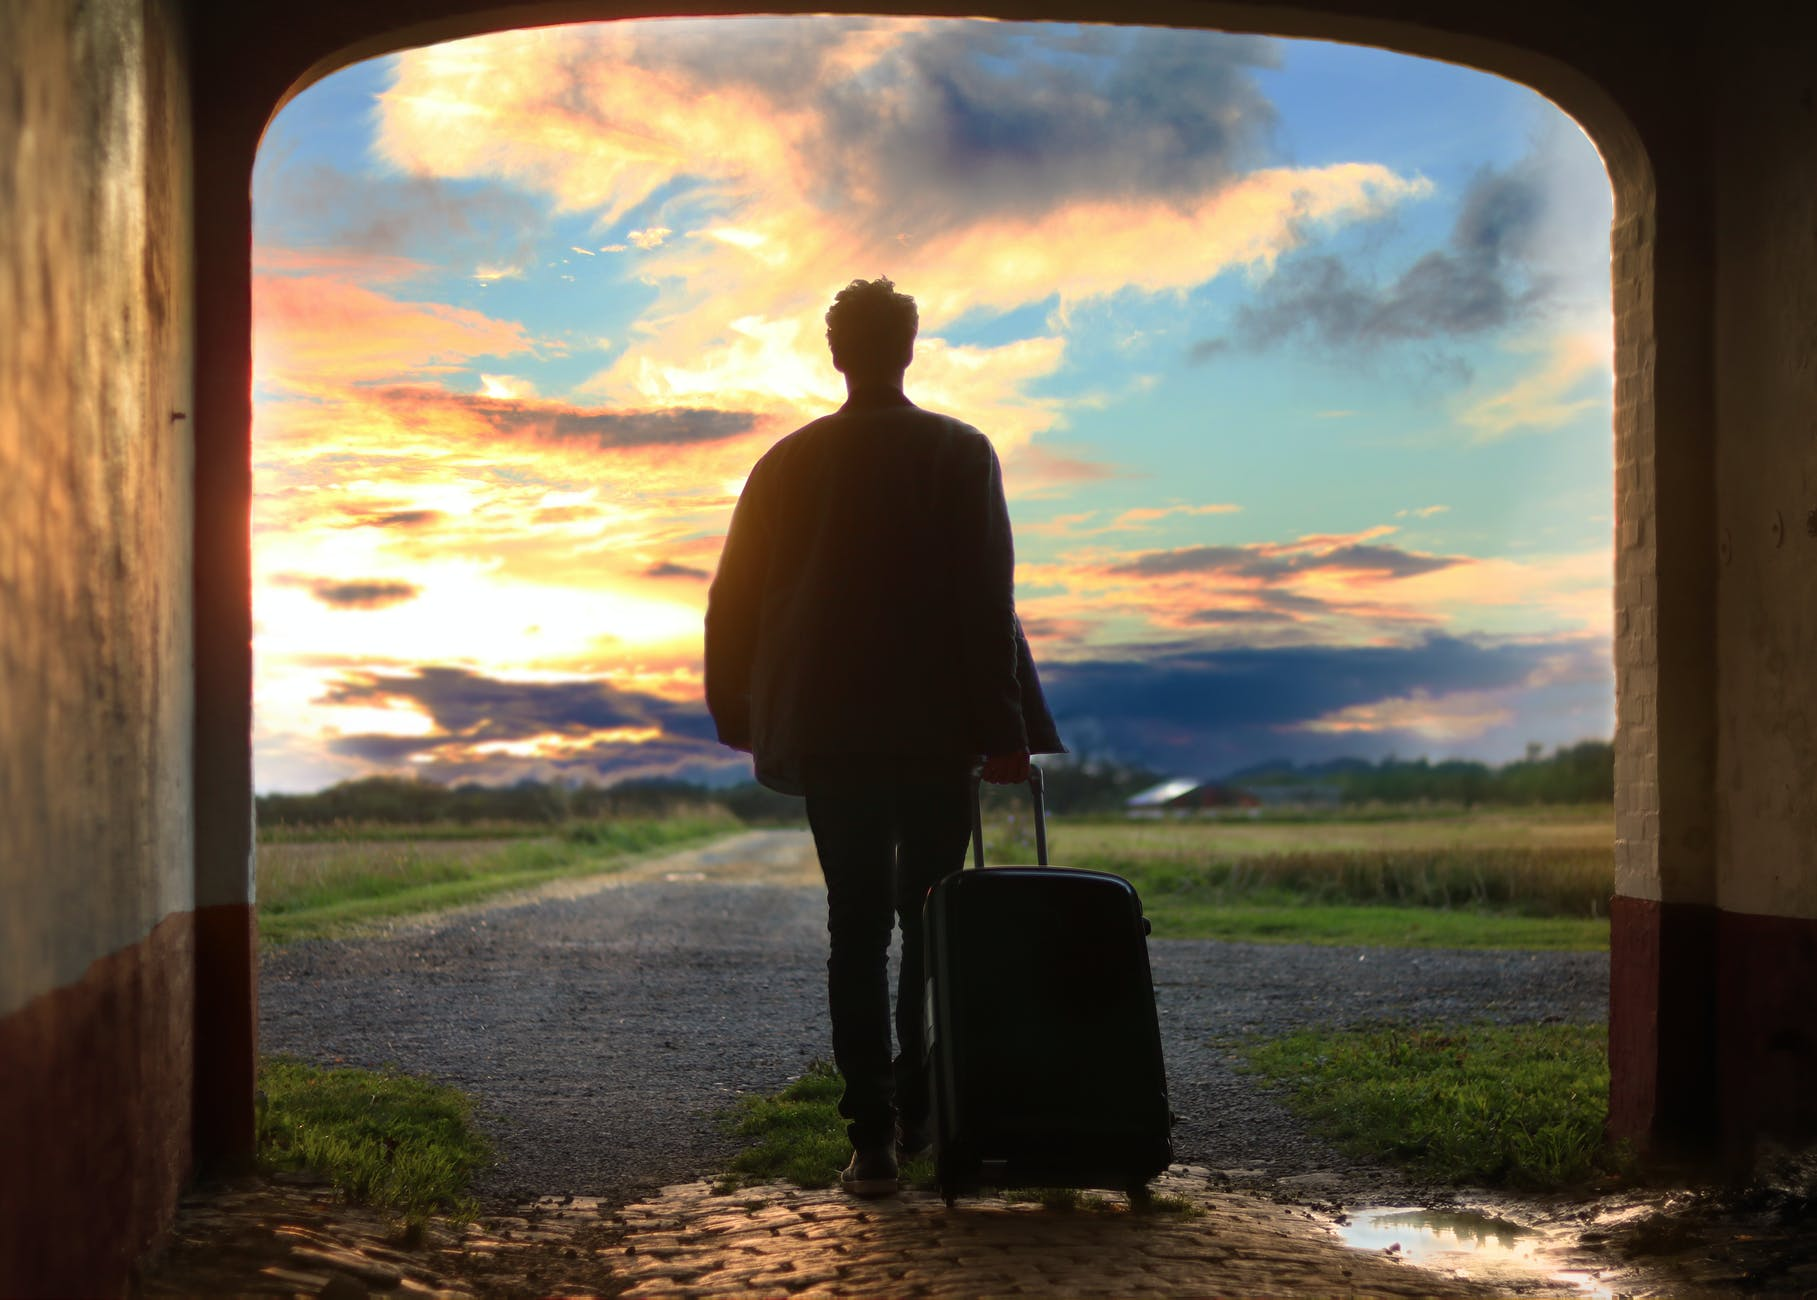 man pulling luggage walking near gray concrete road during sunset